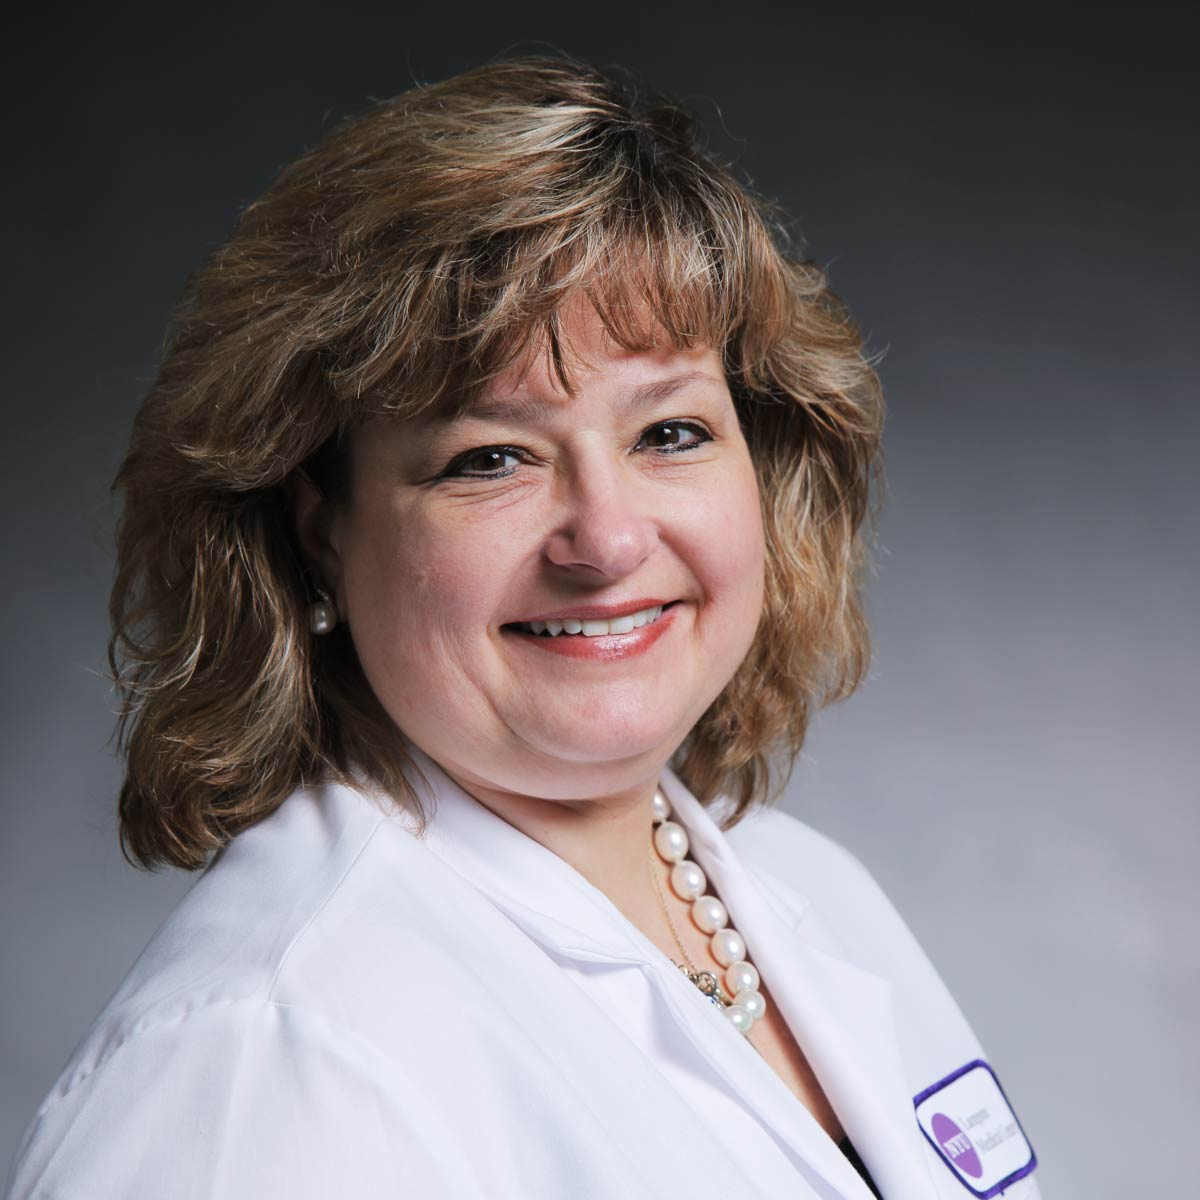 Nyu Langone Login >> Anna C. Pavlick | NYU Langone Health